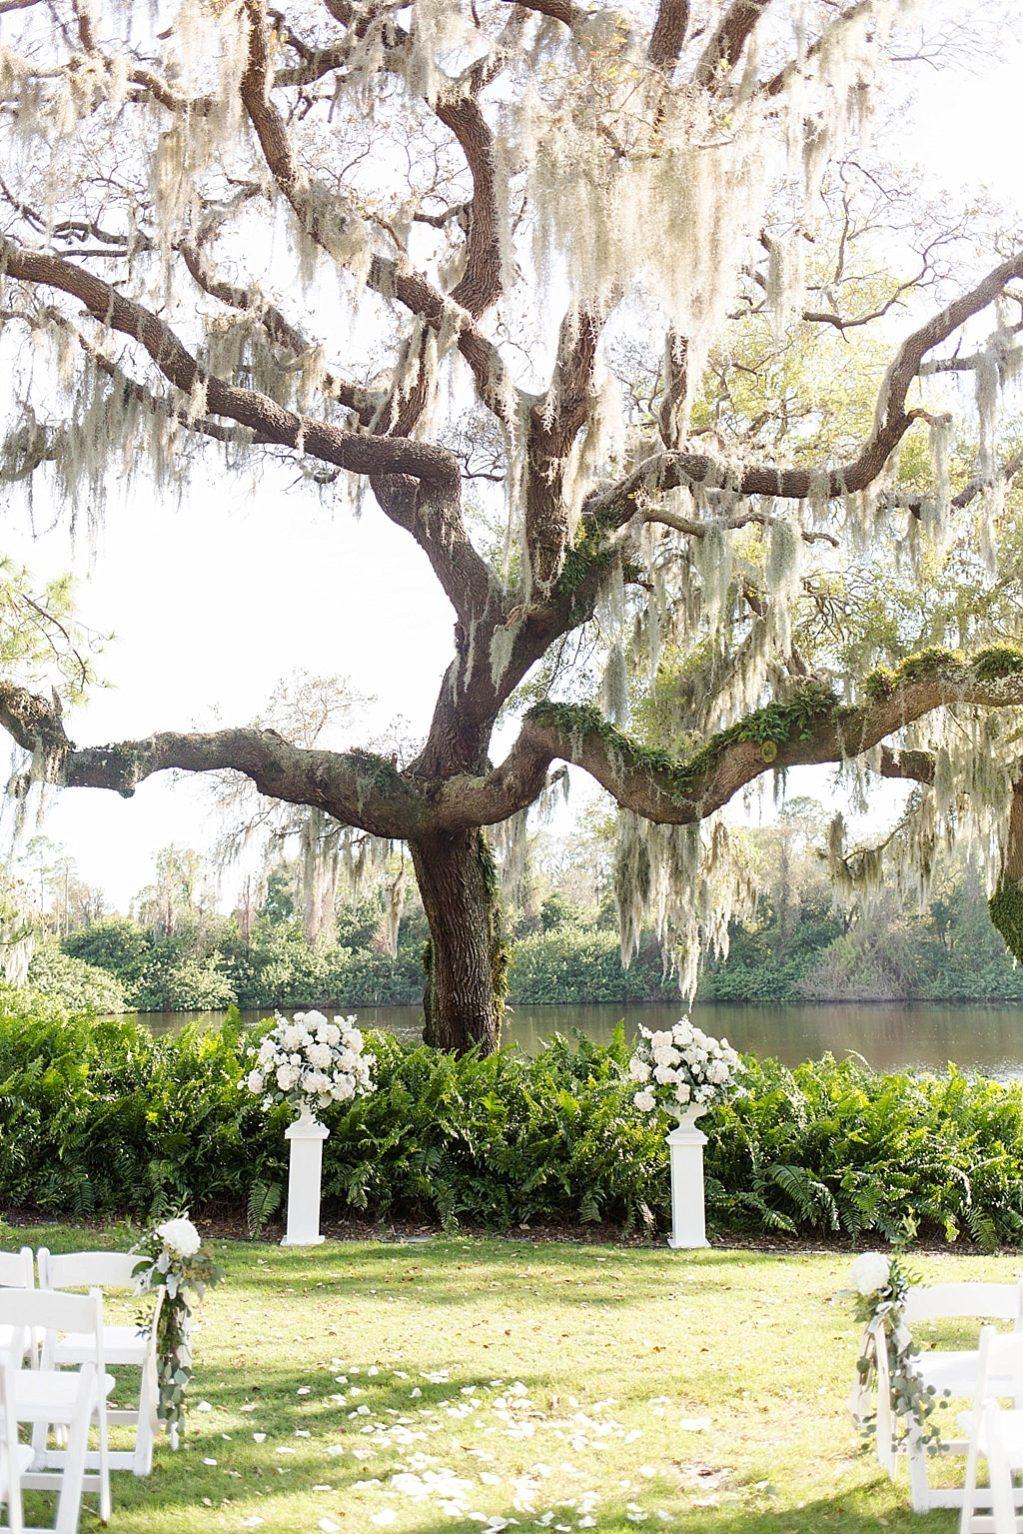 INSTAGRAM ROUND UP Outdoor Rustic Elegant Wedding Ceremony Under Tree, White Pedestals with White Floral Arrangements | Palm Harbor Wedding Venue Innisbrook Golf and Spa Resort